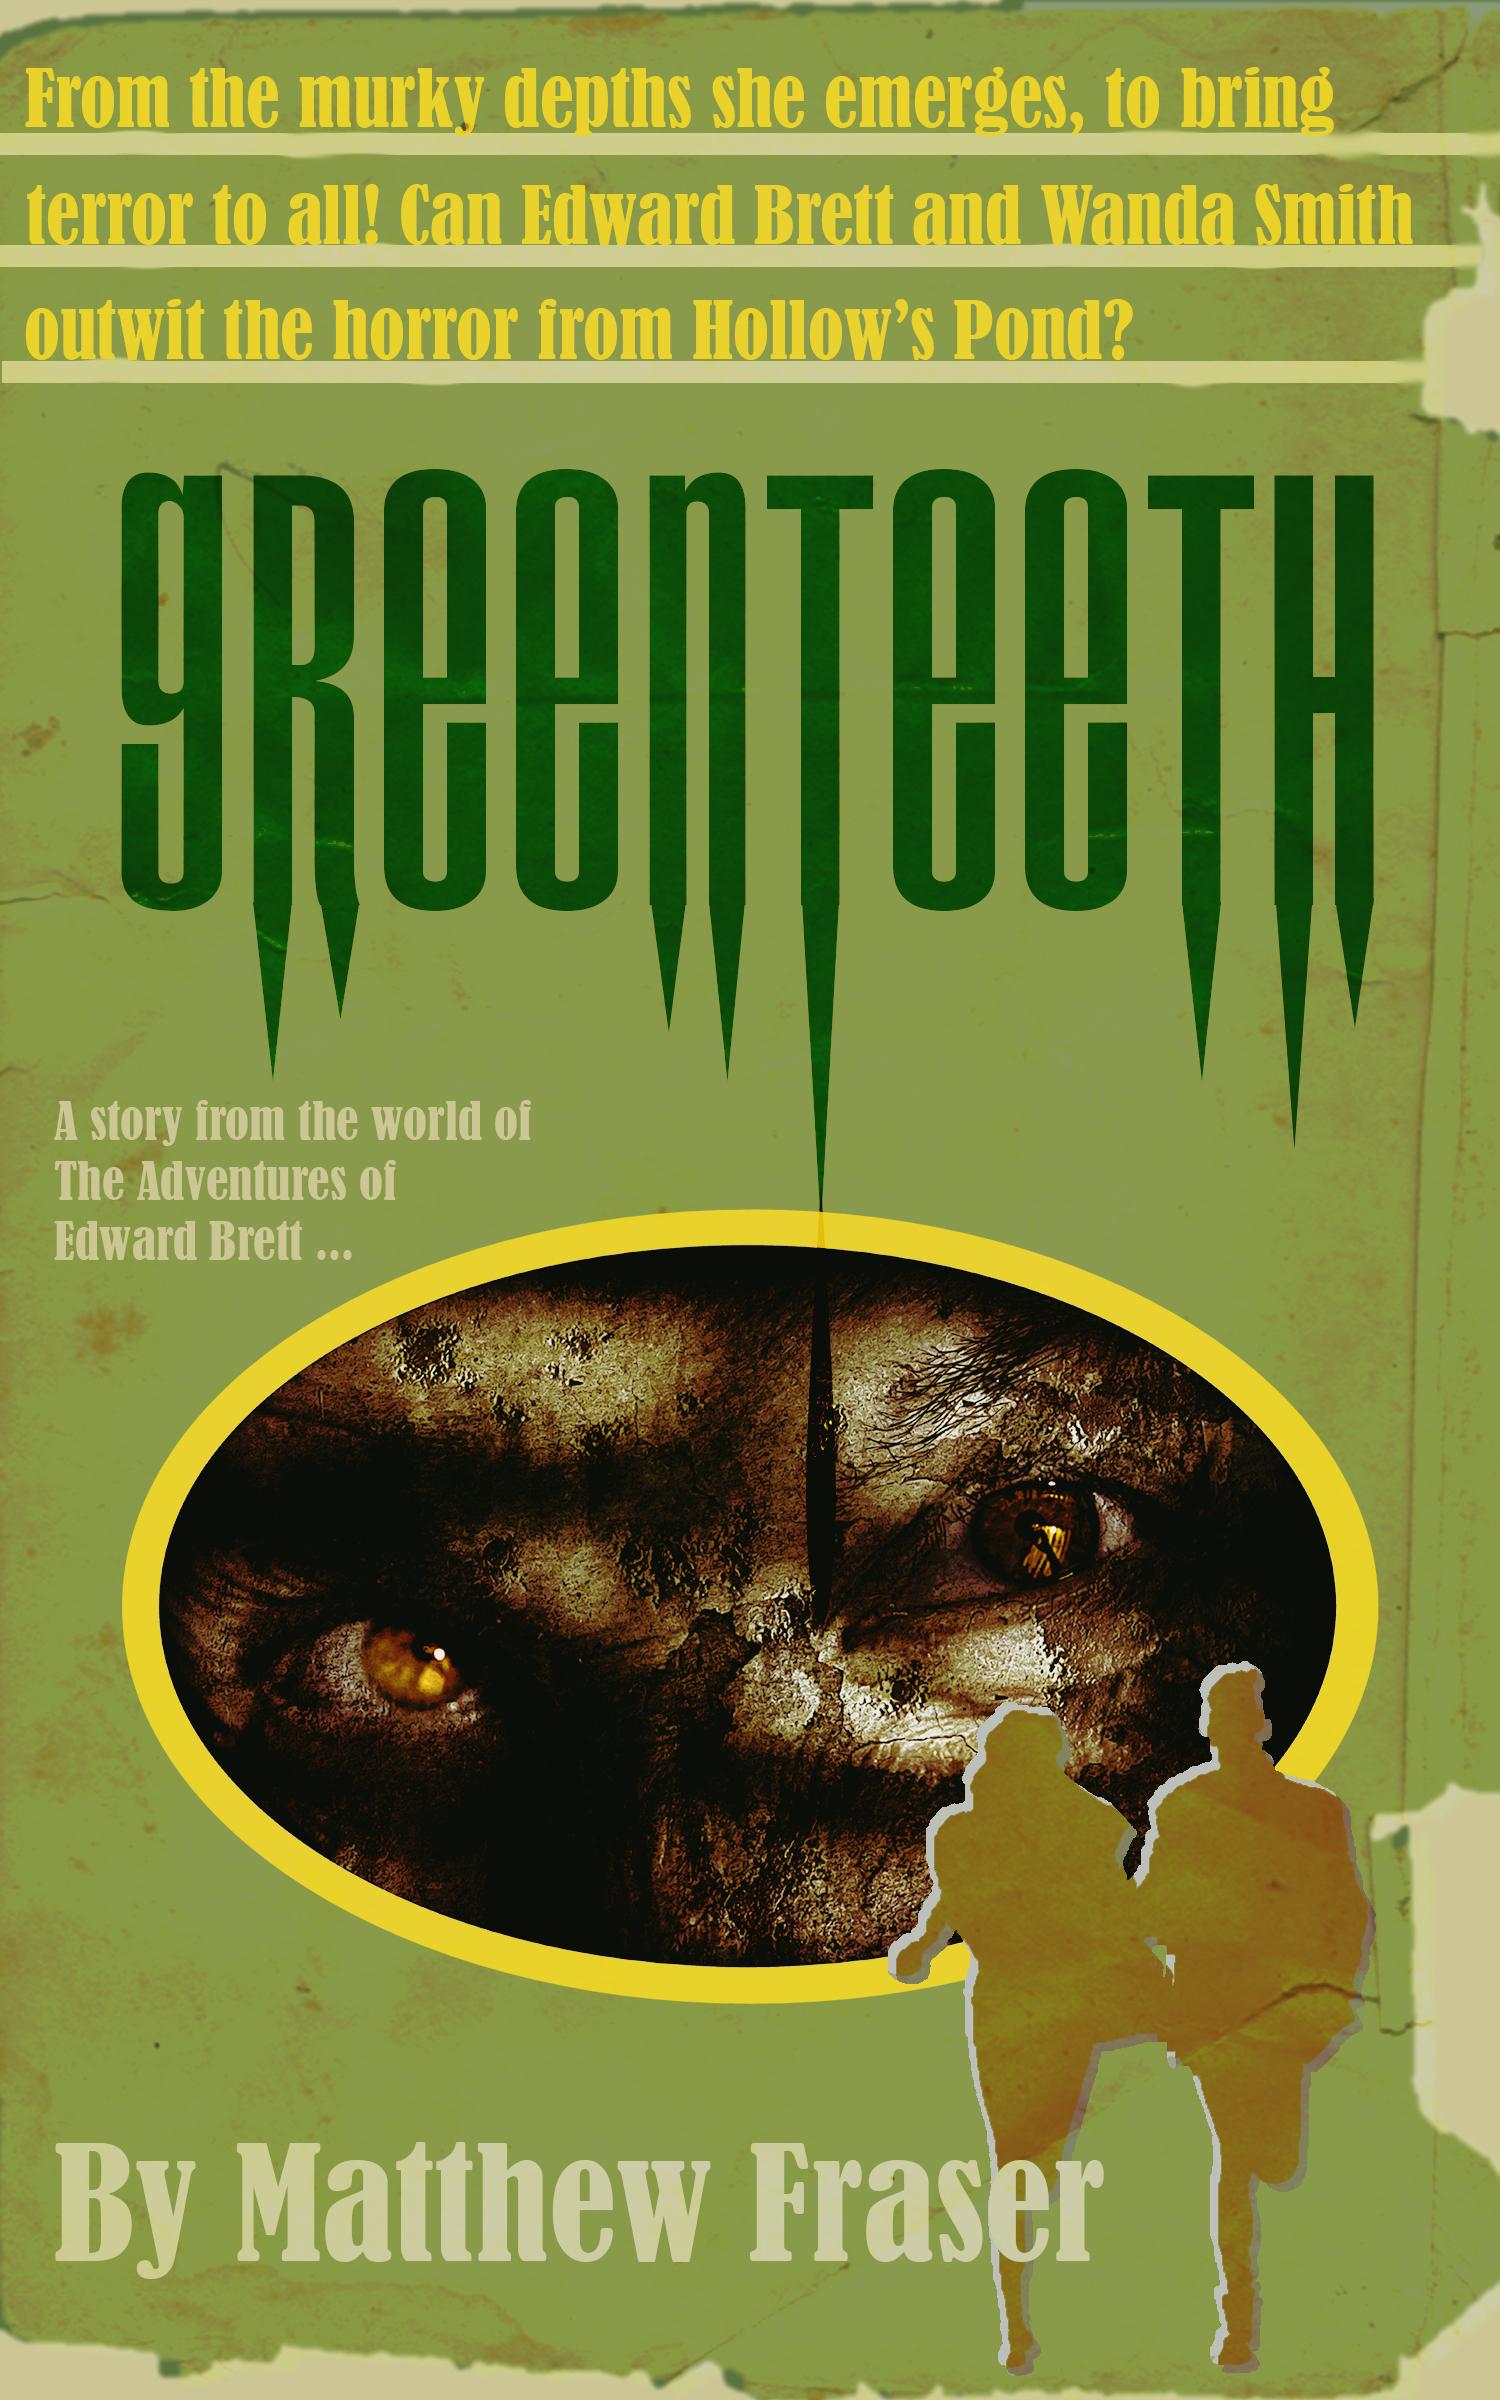 Greenteeth The Adventures of Edward Brett Free at Kobo